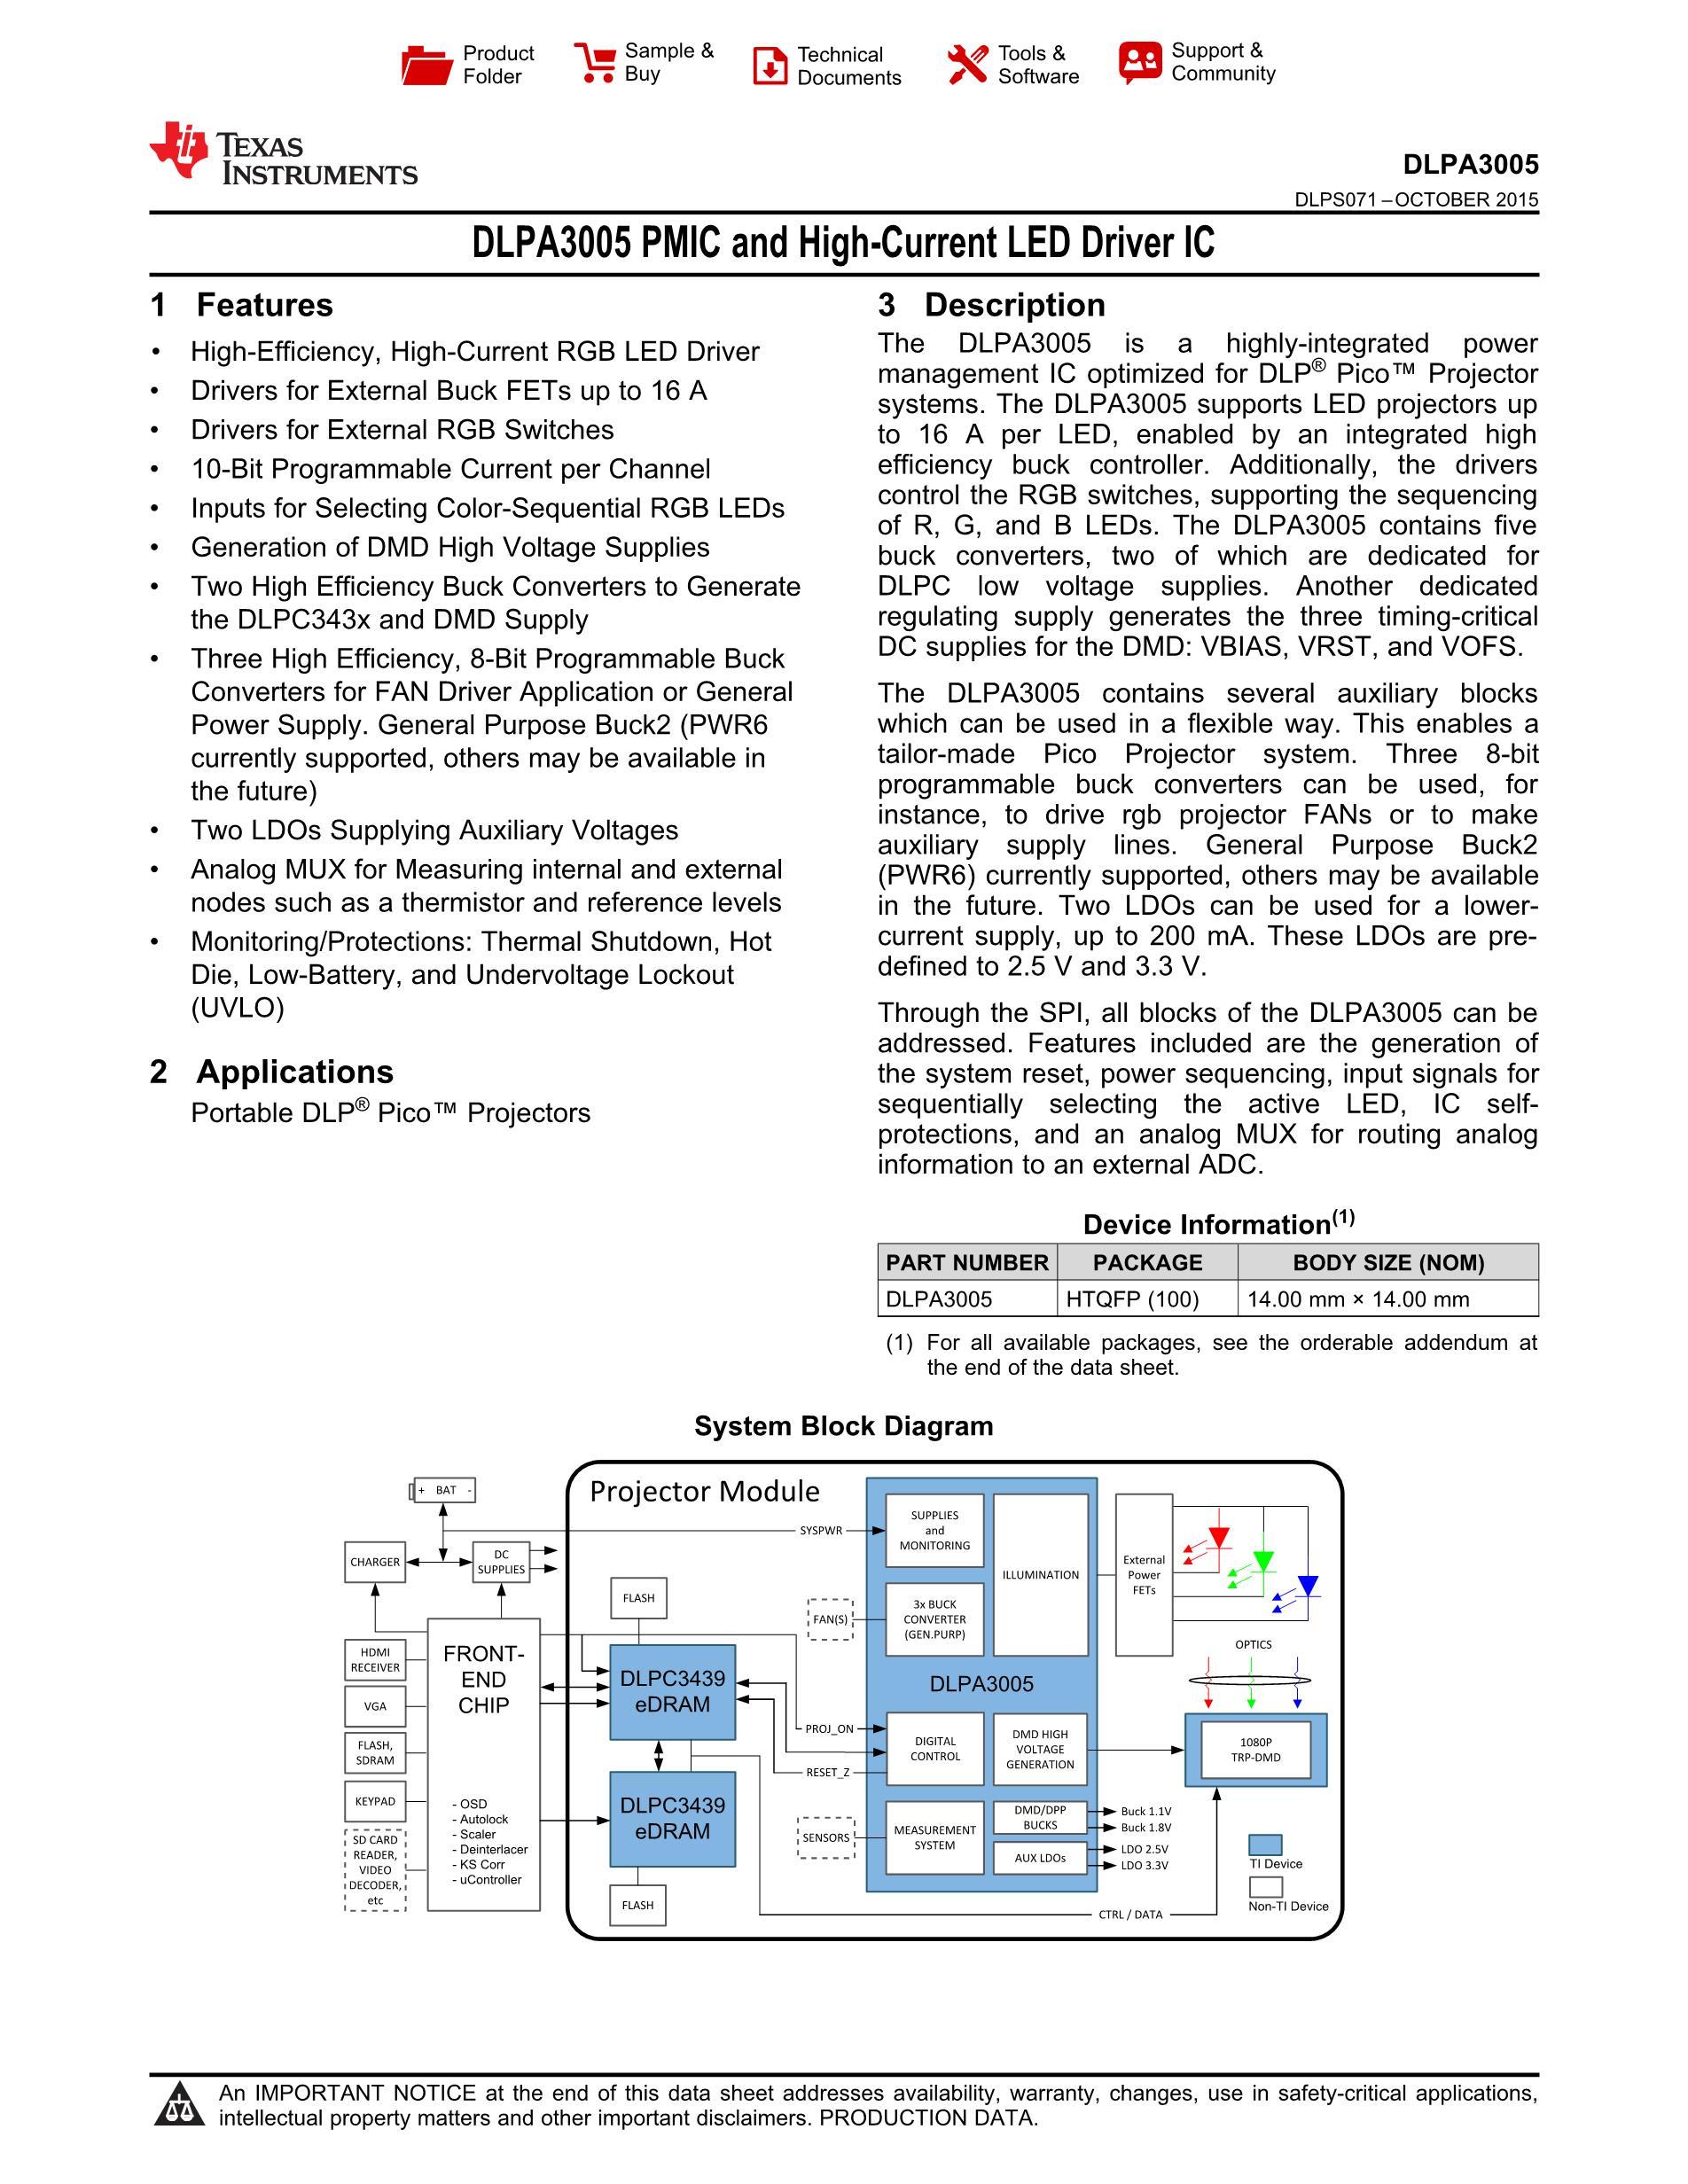 DLPA3005CPFDR's pdf picture 1